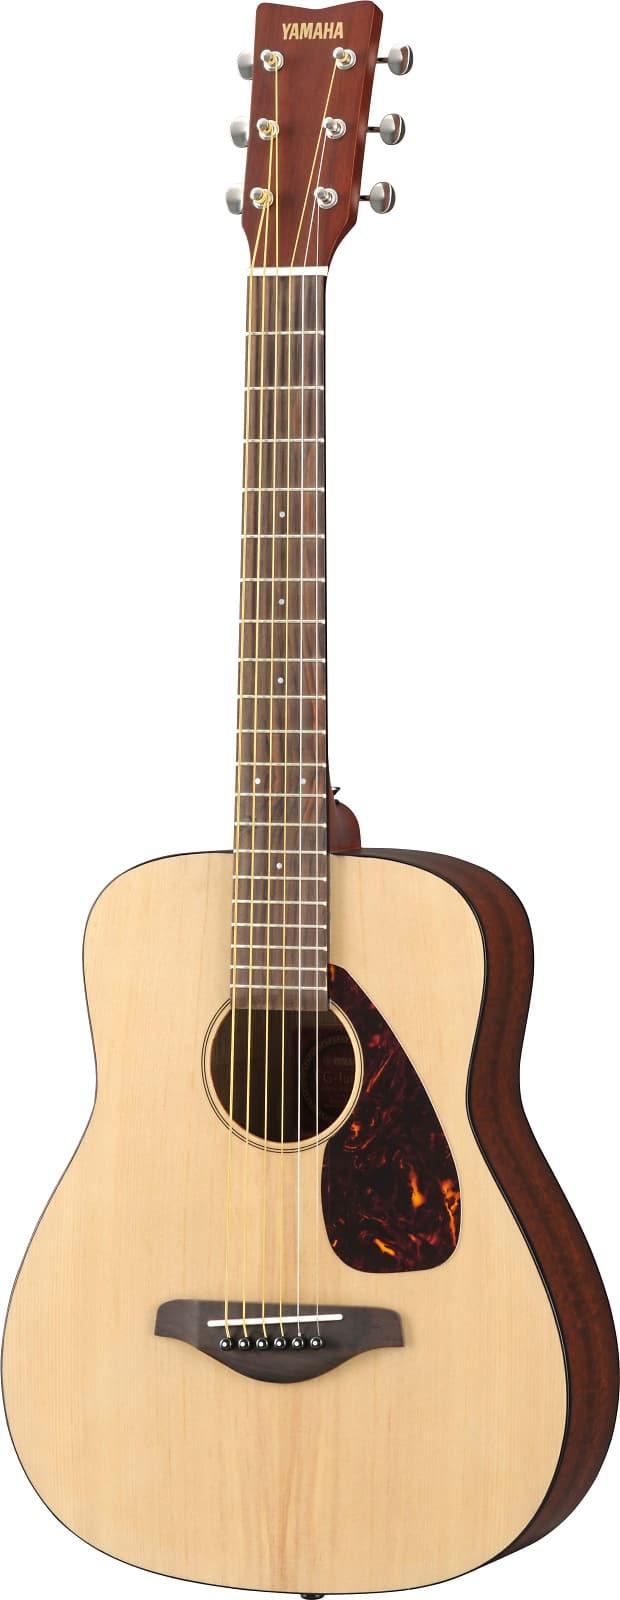 yamaha jr2 3 4 size acoustic guitar natural reverb